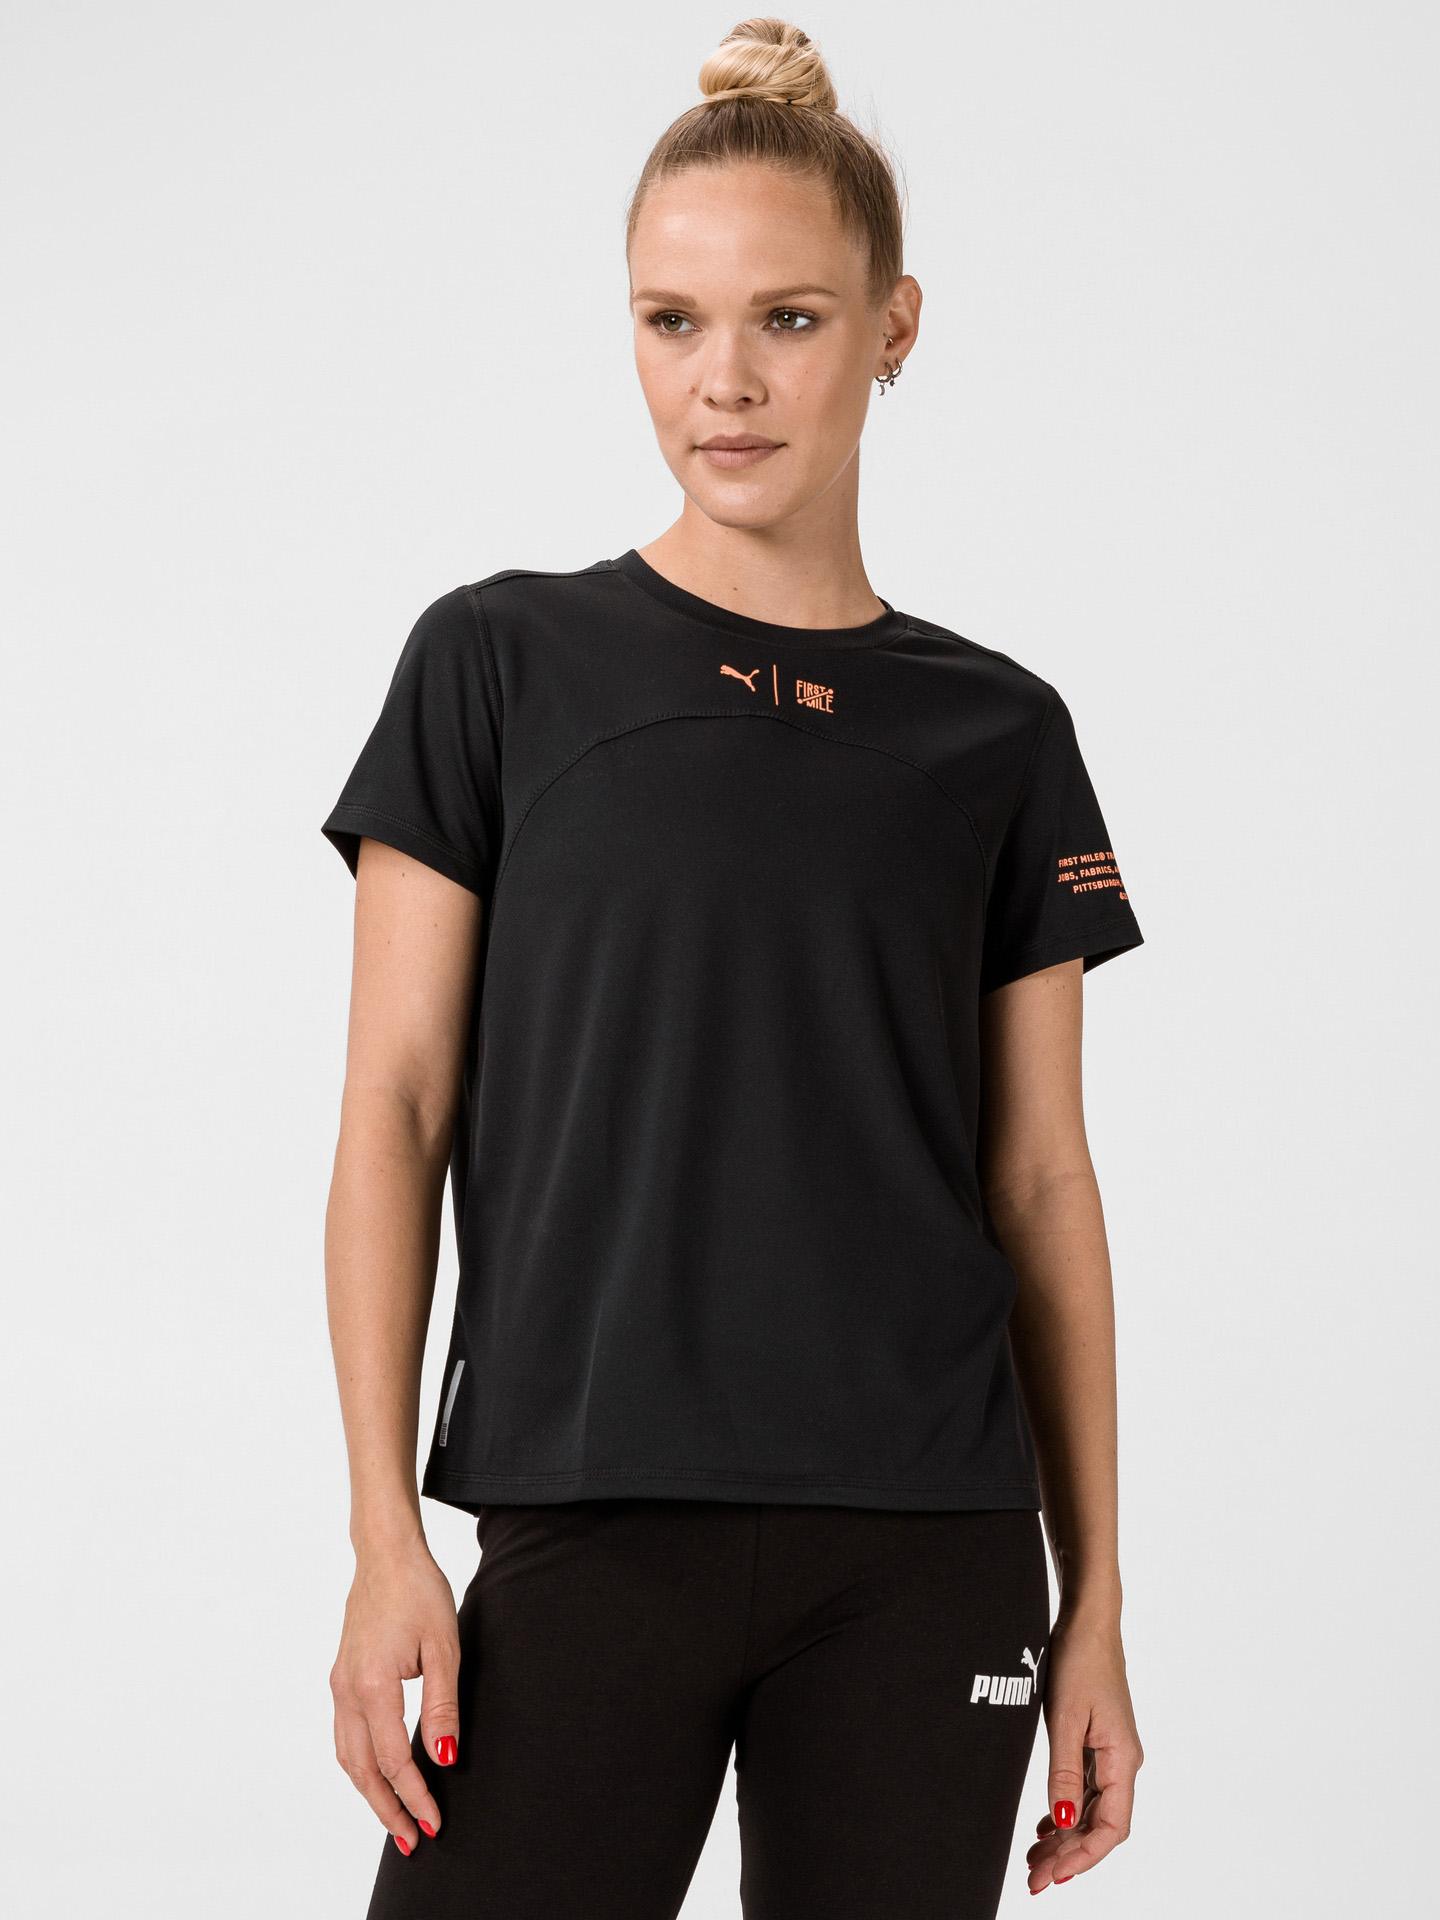 Puma czarny damska koszulka The First Mile